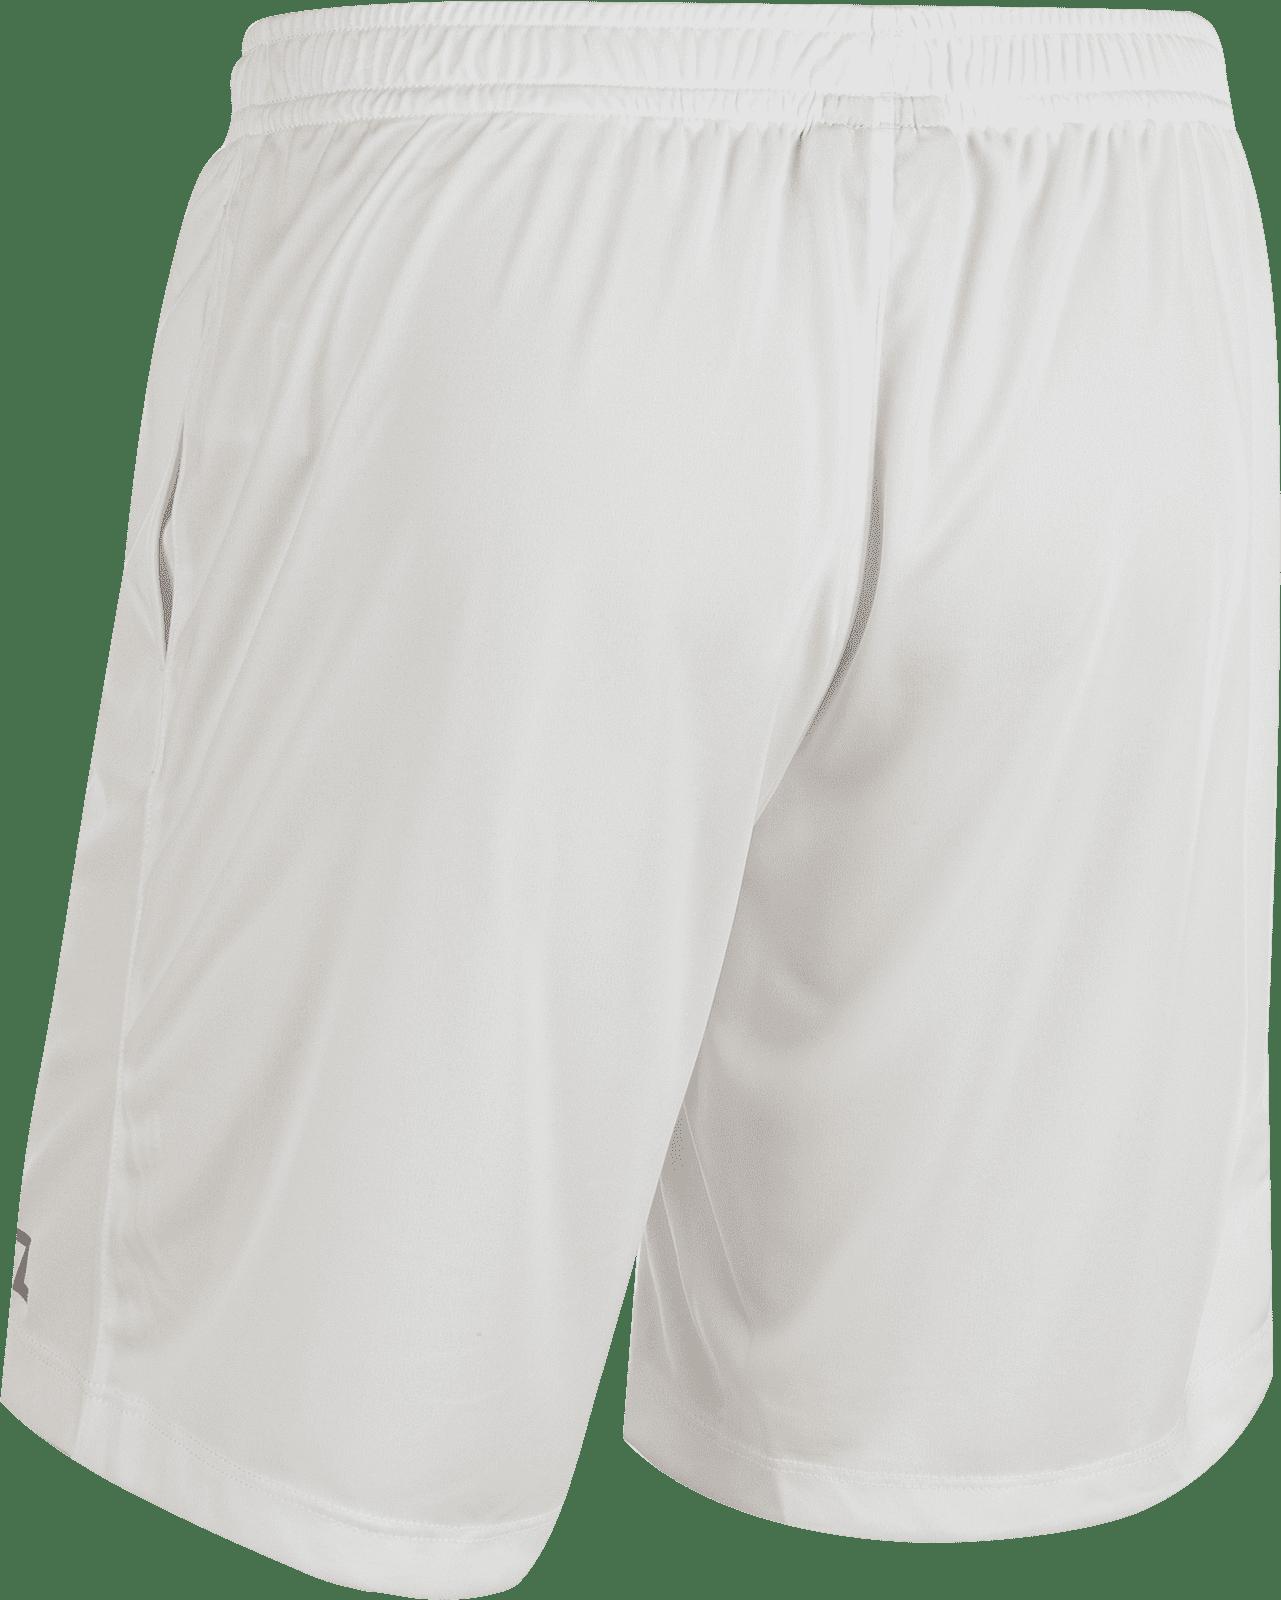 Forza Landers Shorts, 0099 White